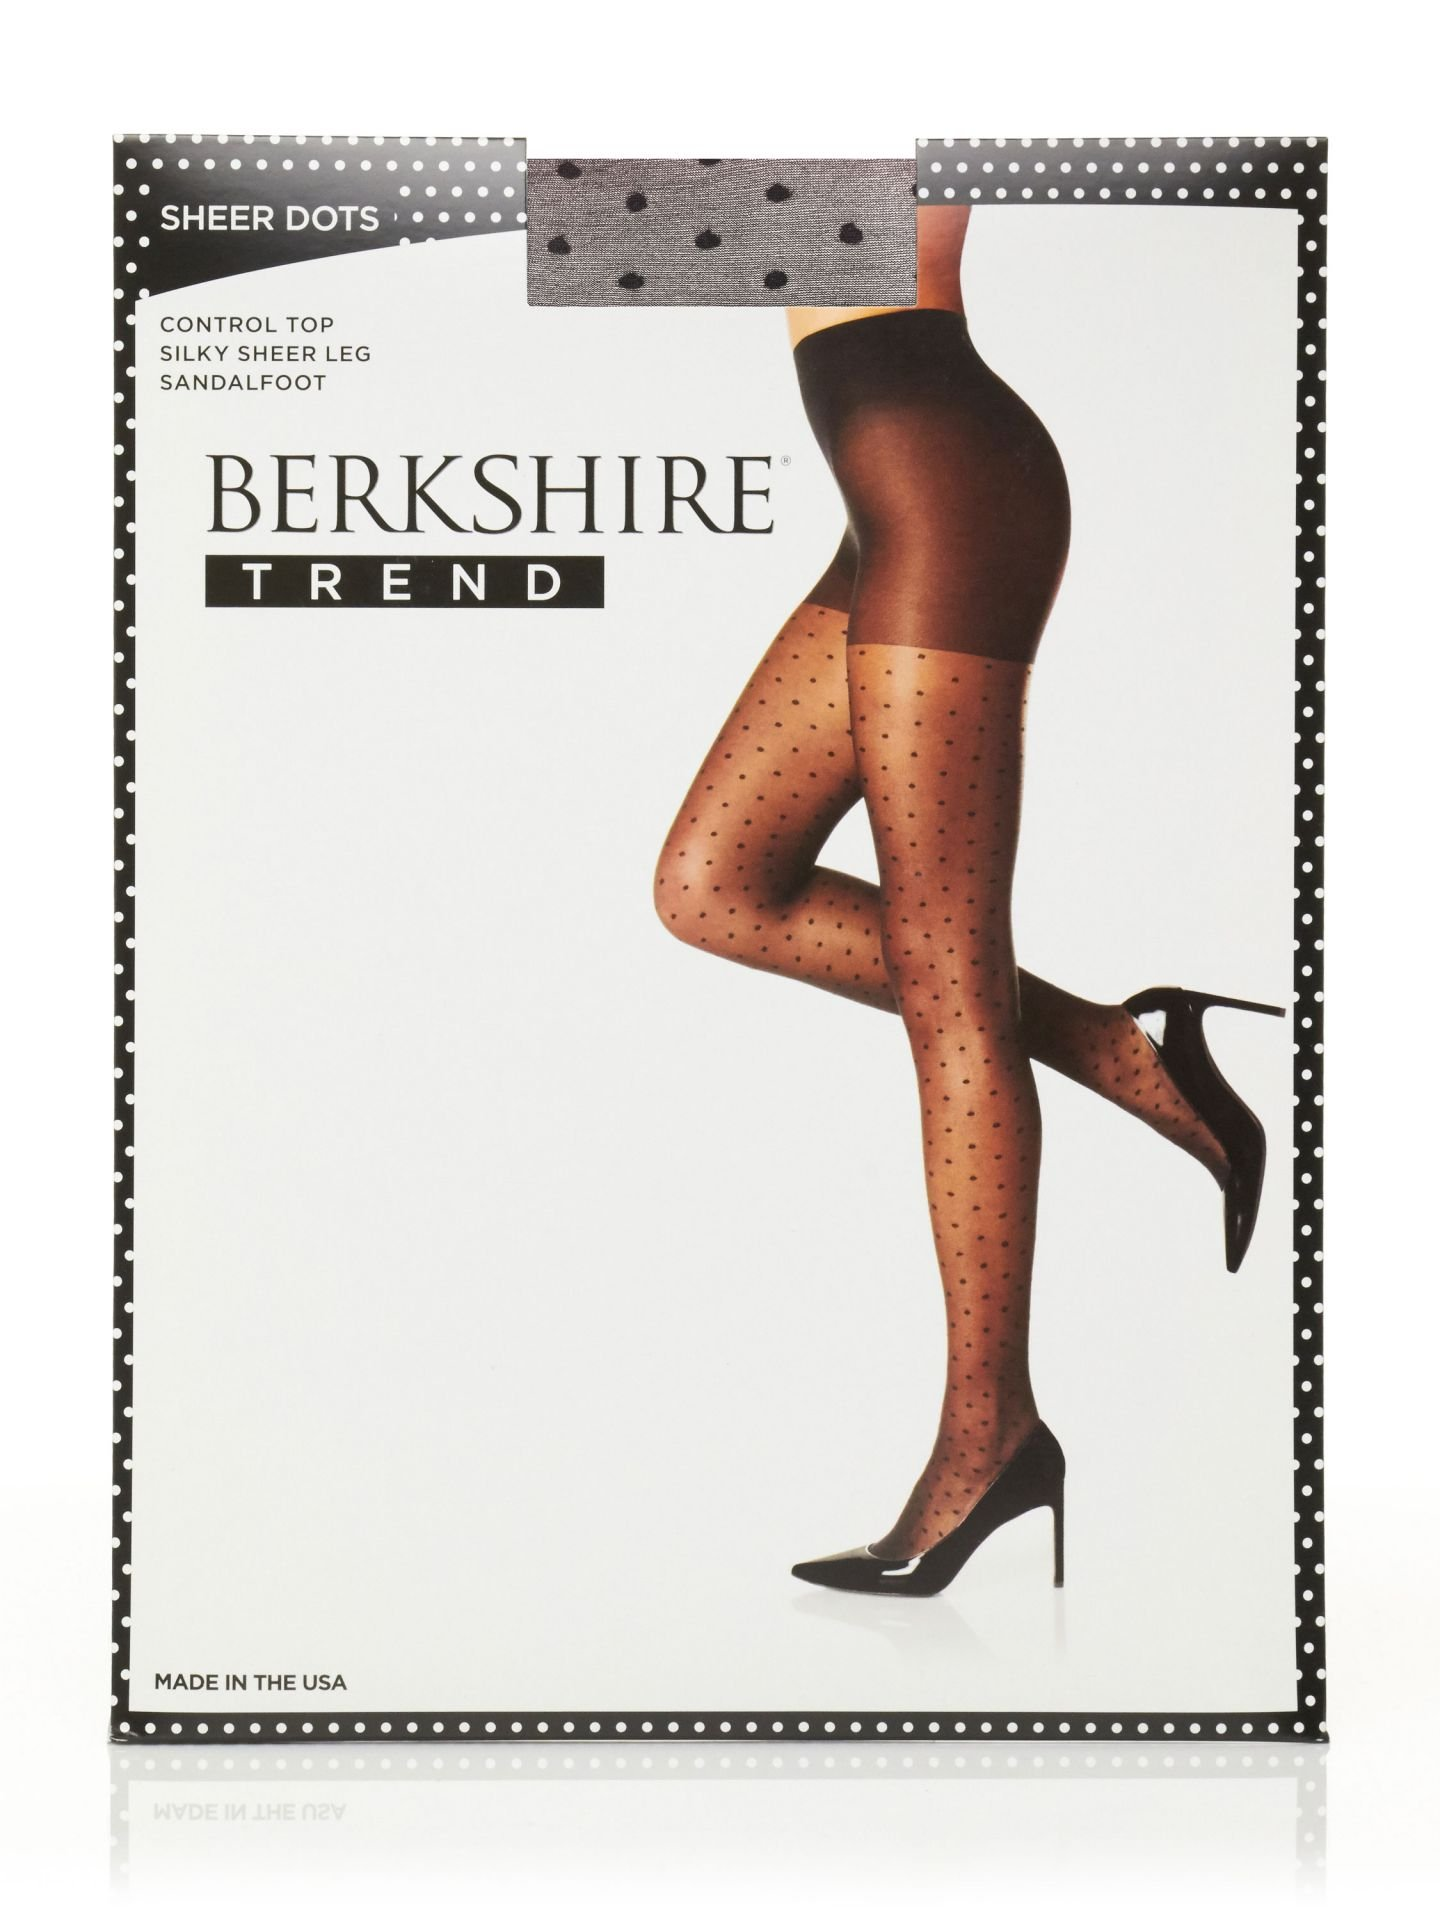 Berkshire Women's Trend Sheer Dot Control Top Pantyhose, Fantasy Black, 2 Plus